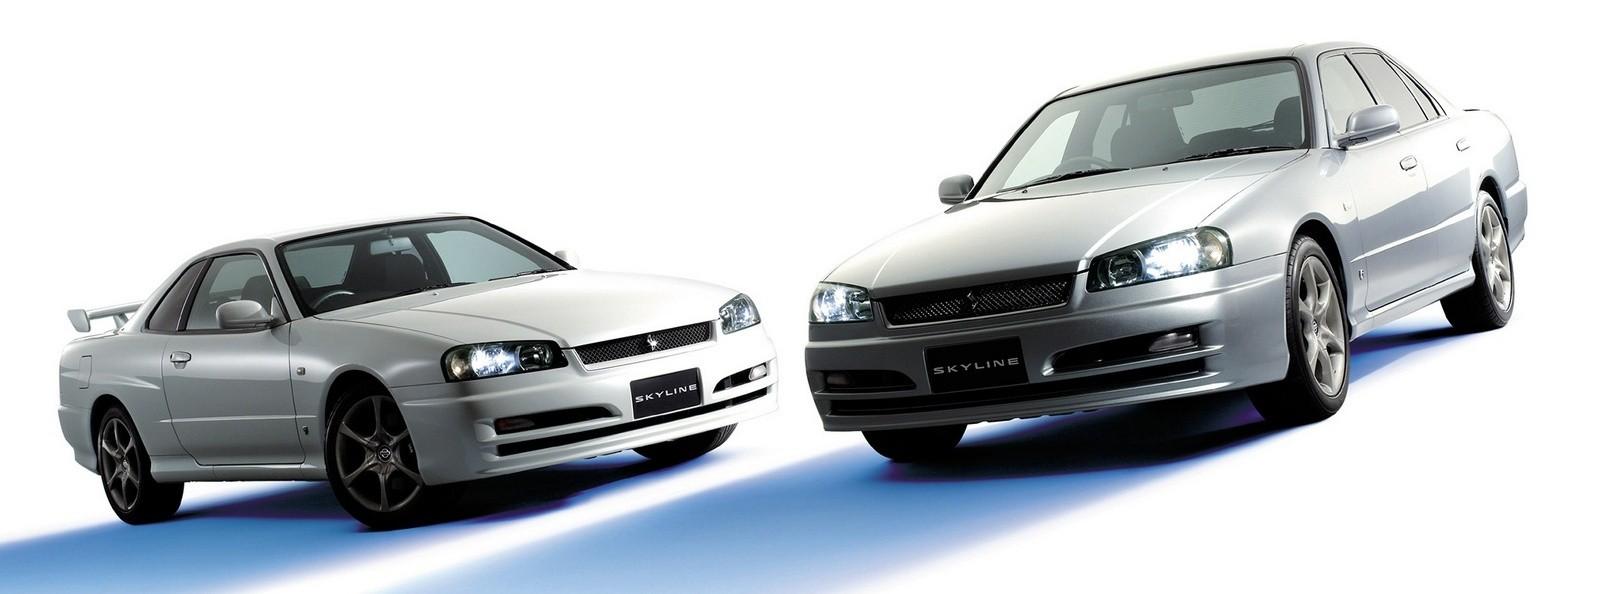 Nissan-Skyline-R34-1998-2002 (1)